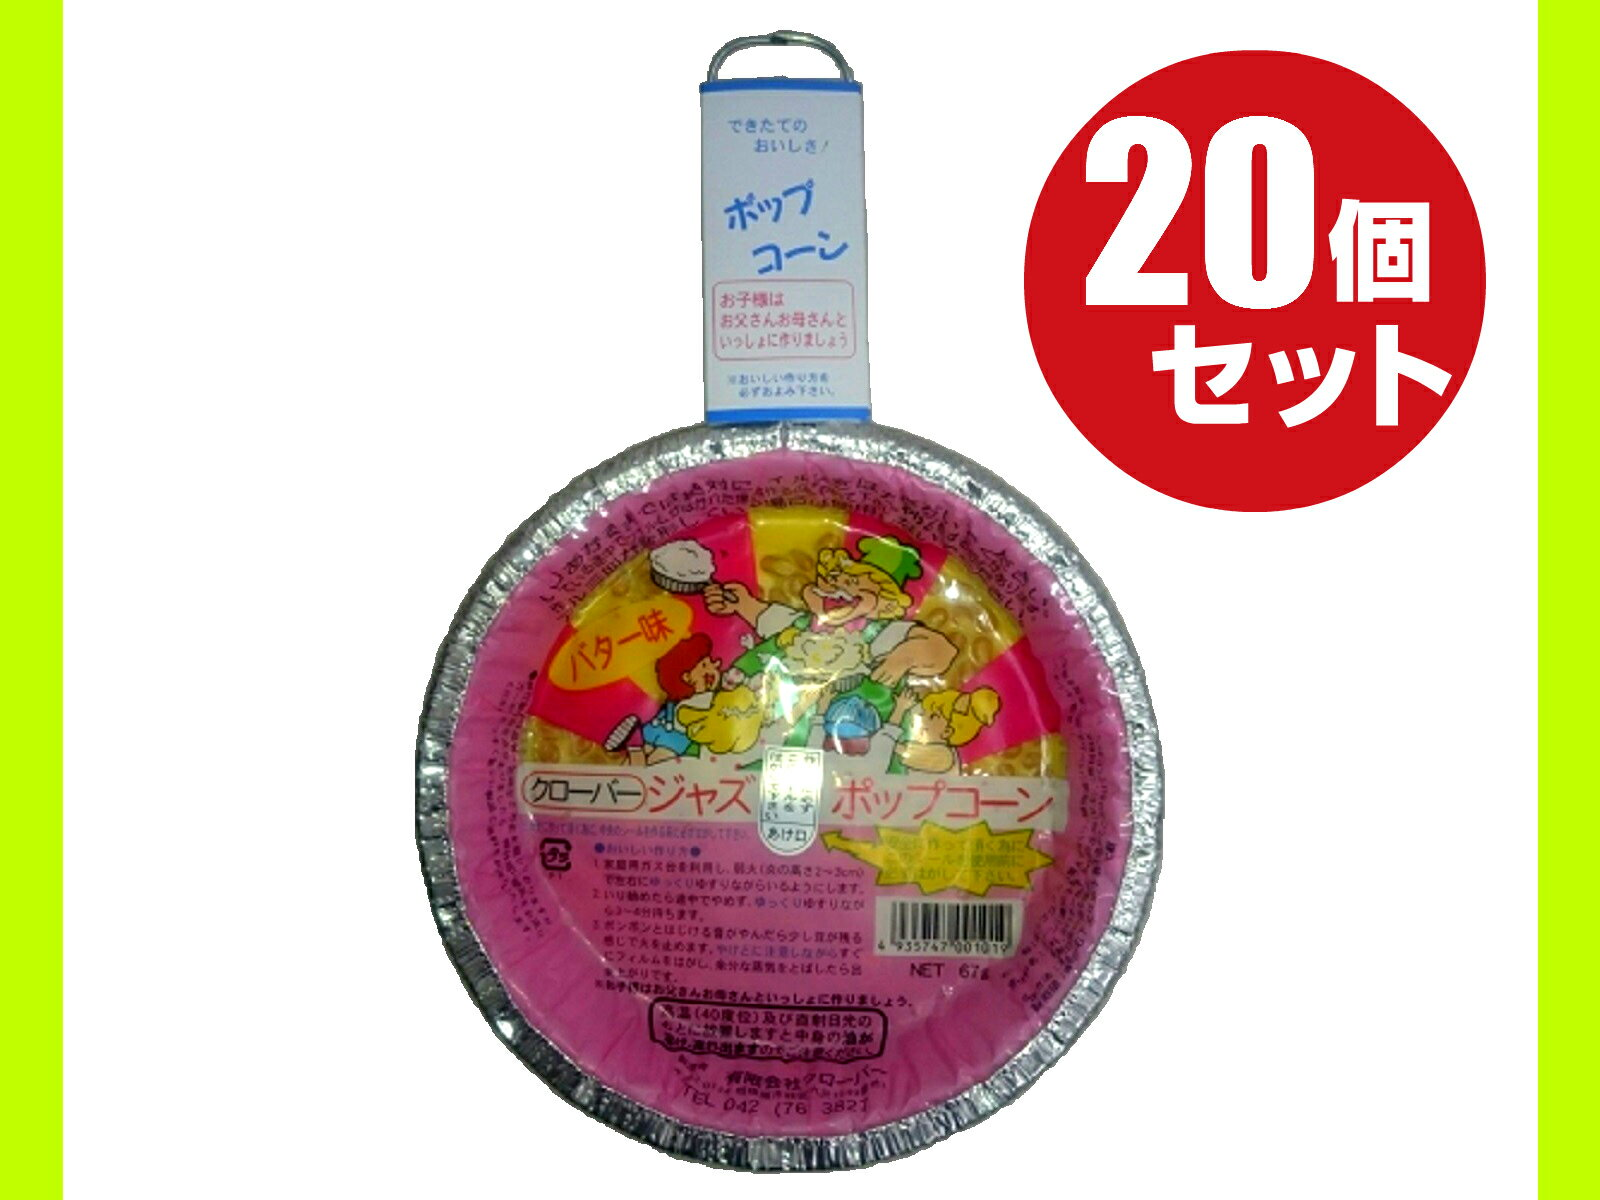 【IH可】ジャズポップコーン(バター)20個入り★パーティー